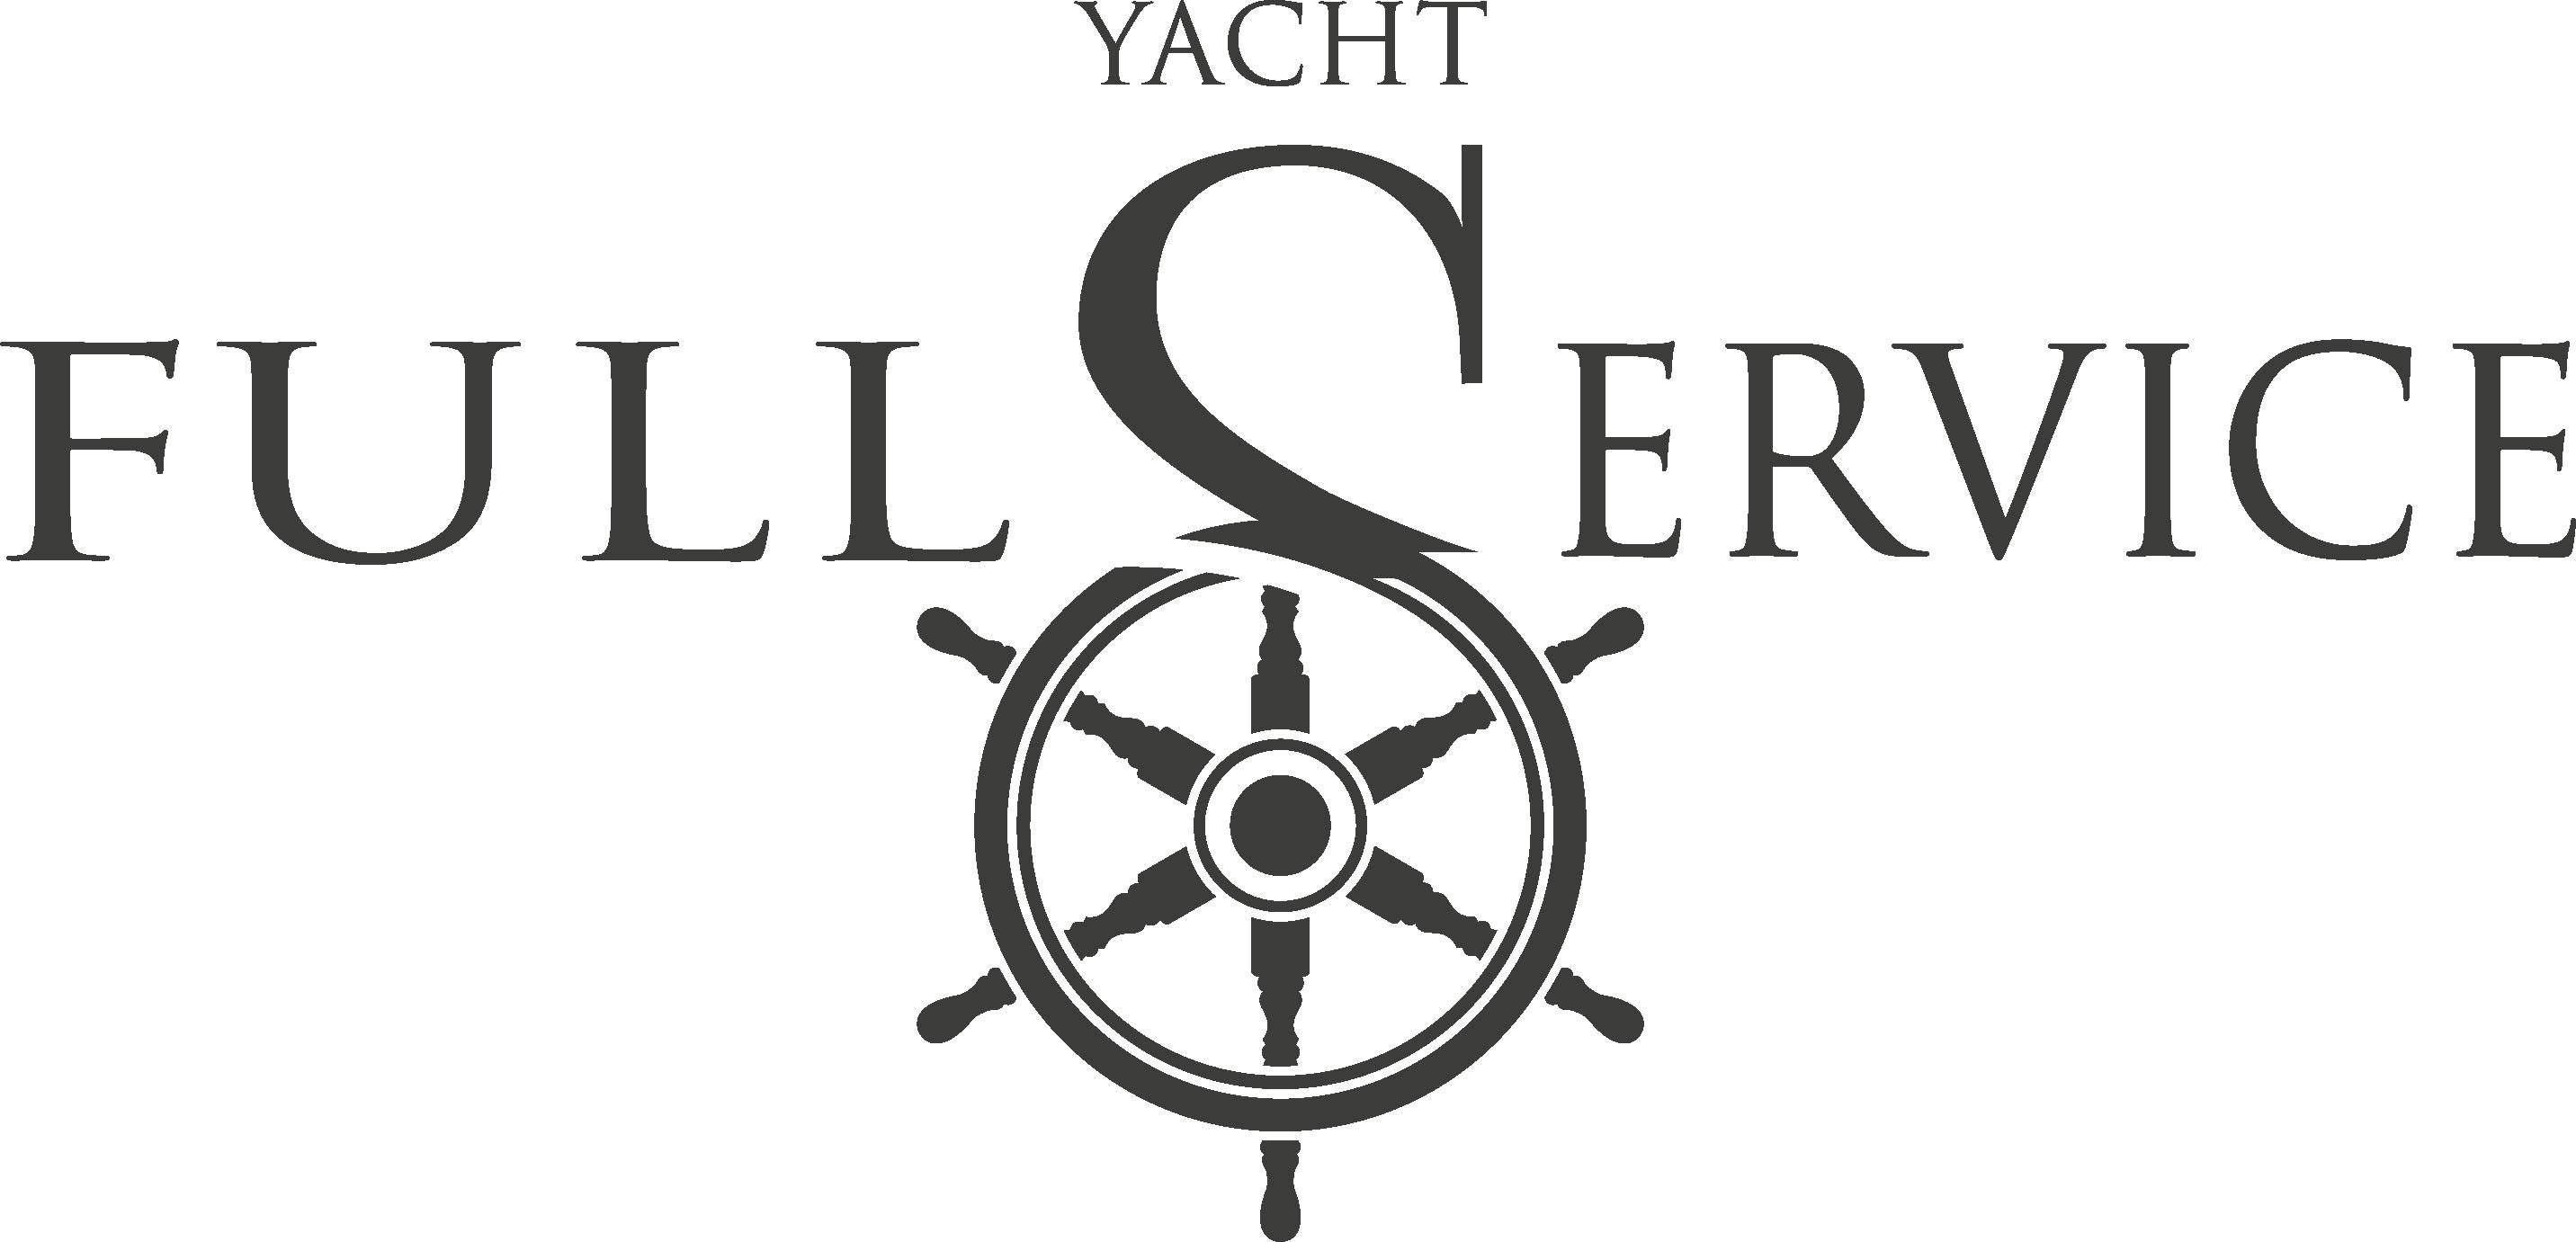 Yacht Full Service